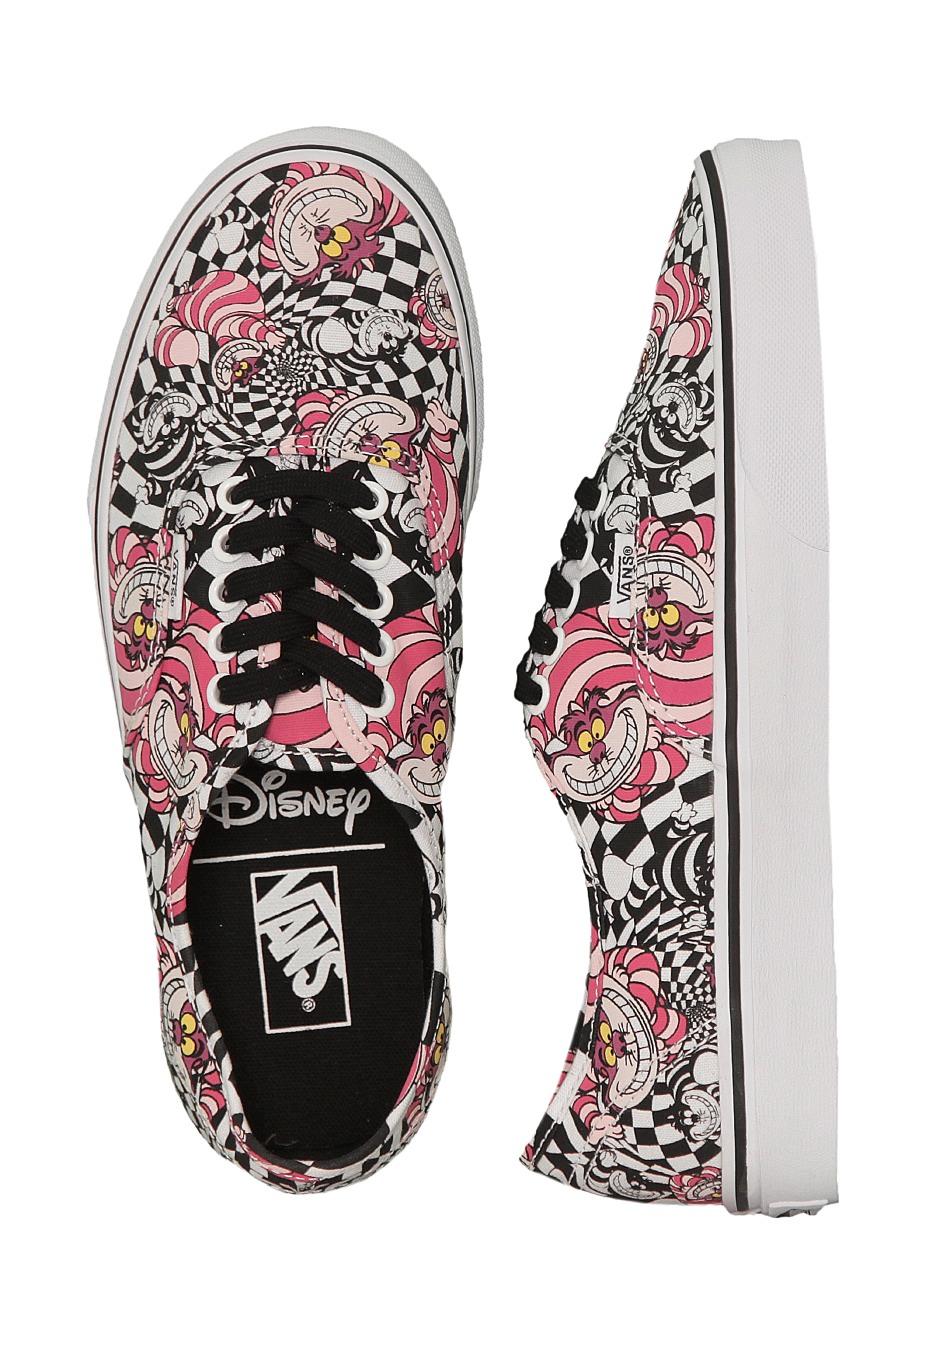 Vans Boty Disney